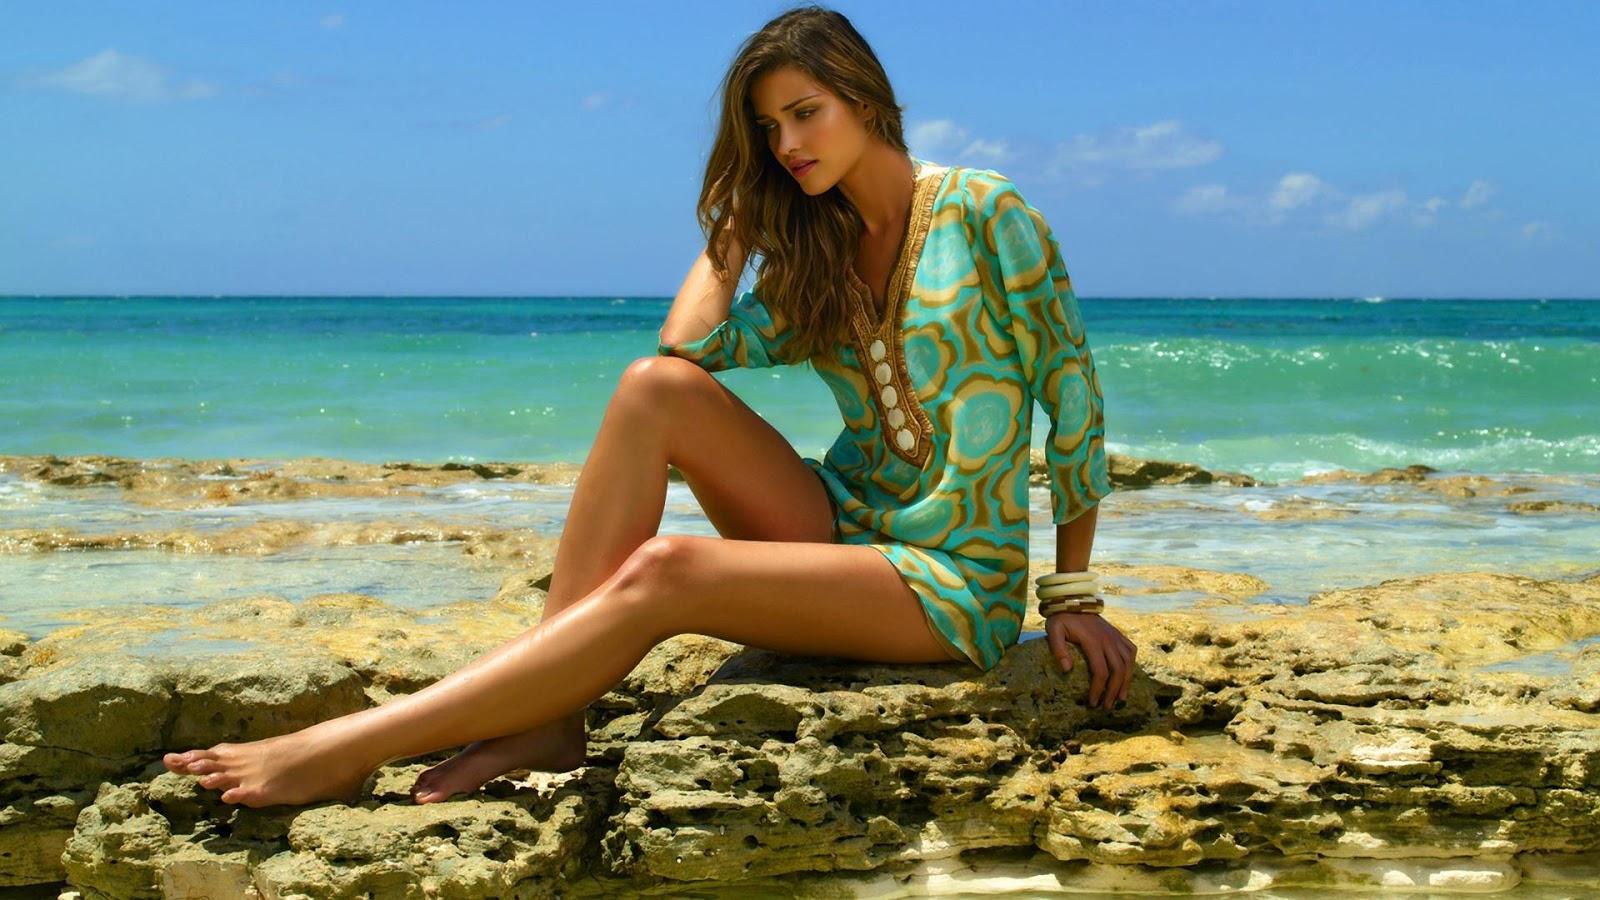 Gallianmachi cute or sexy hot girls the best hq wallpapers - Beach girl wallpaper hd ...